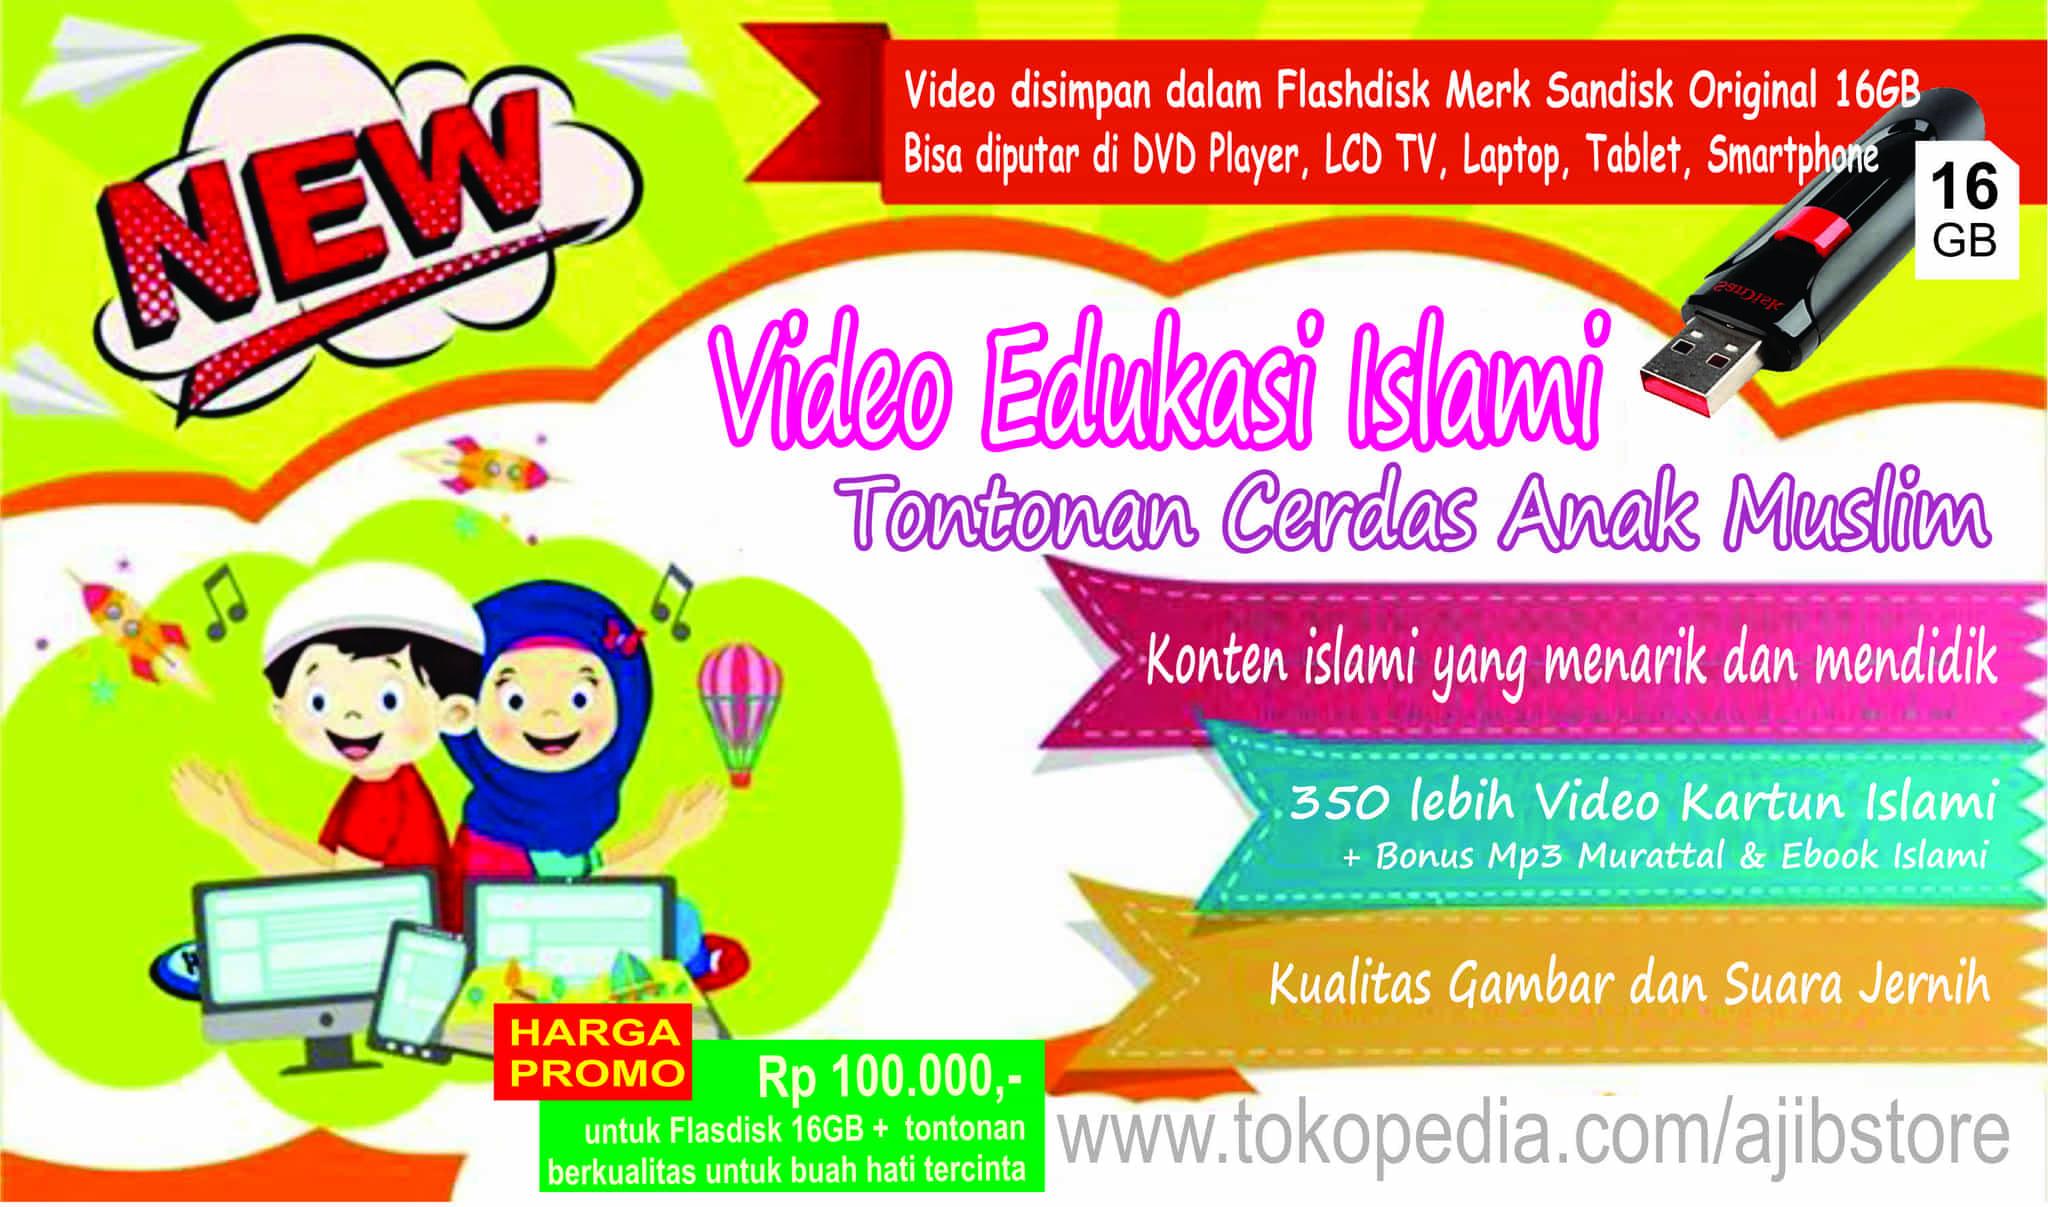 Flashdisk 16gb Original Berisi 350 Video Kartun Edukasi Anak